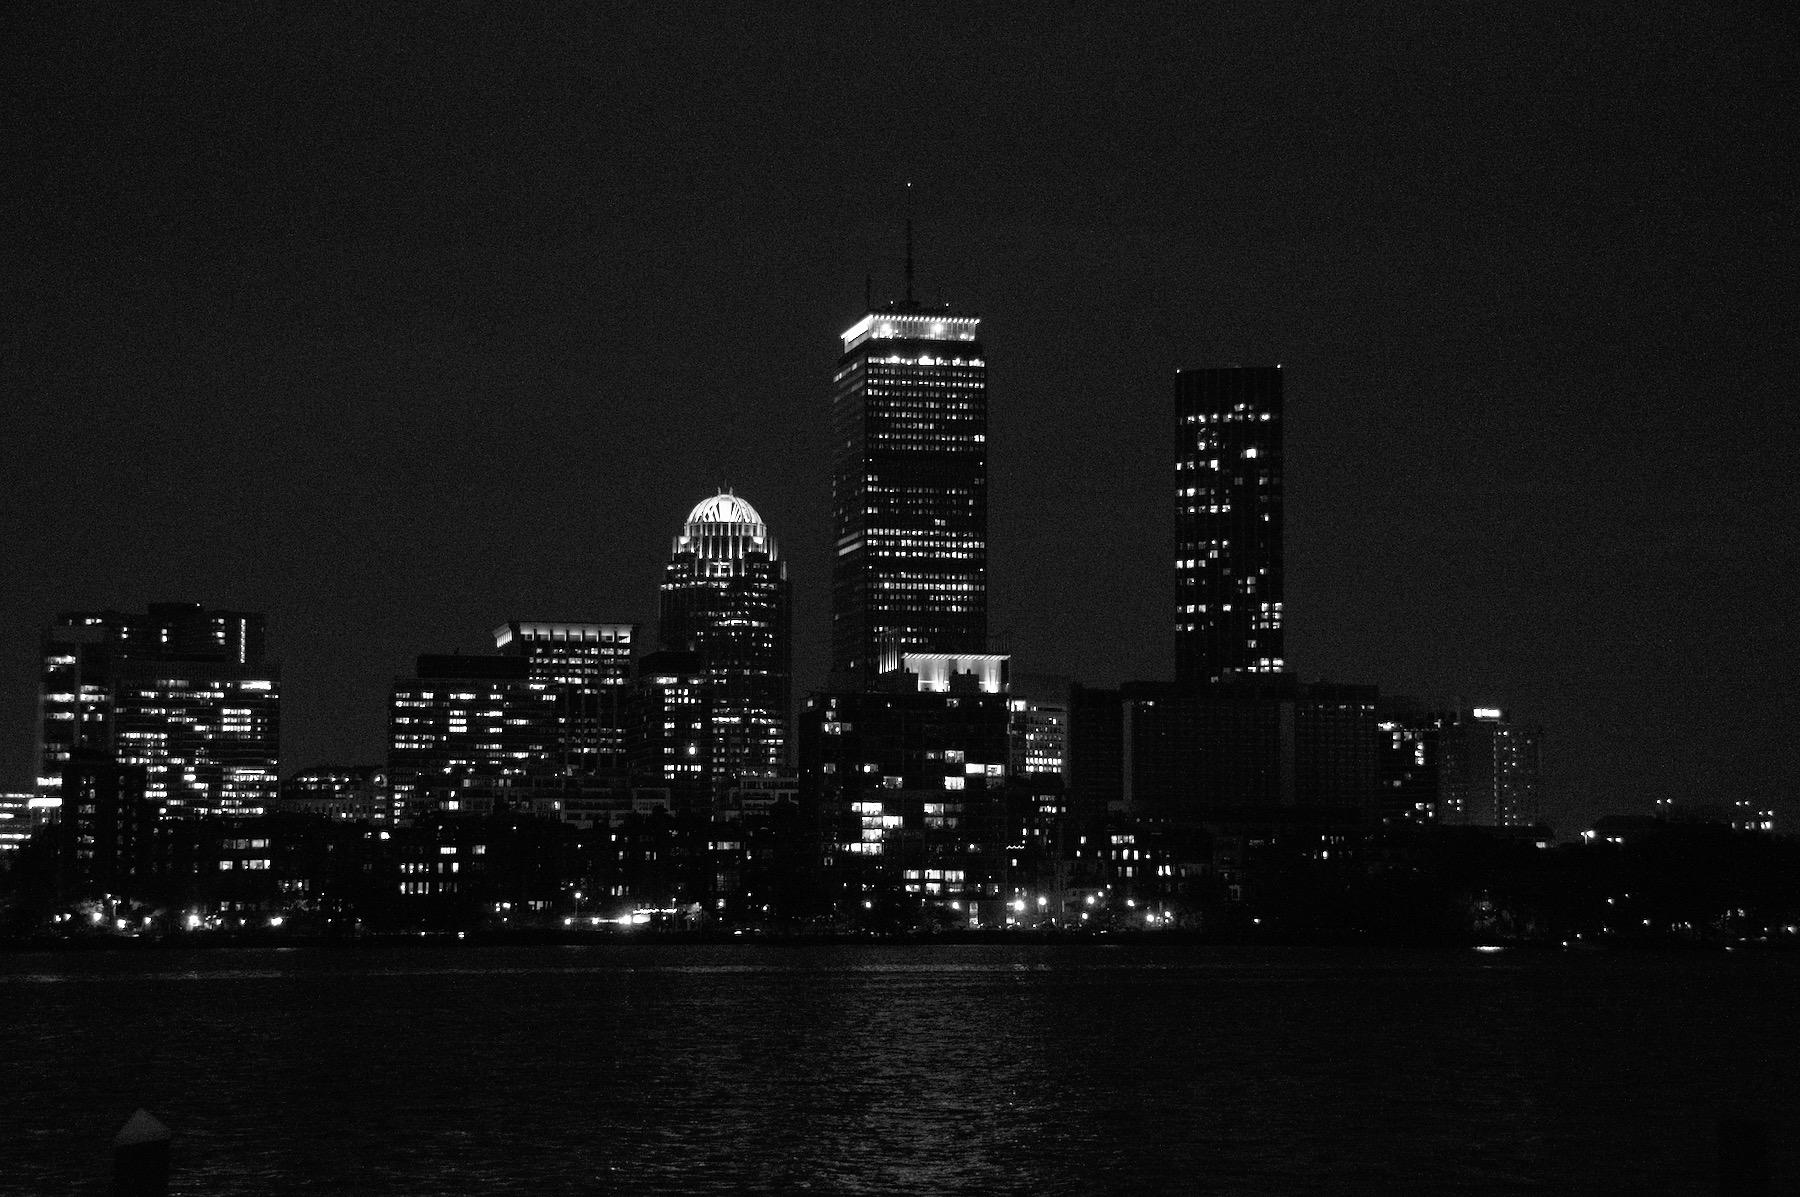 Boston Night Skyline feature image